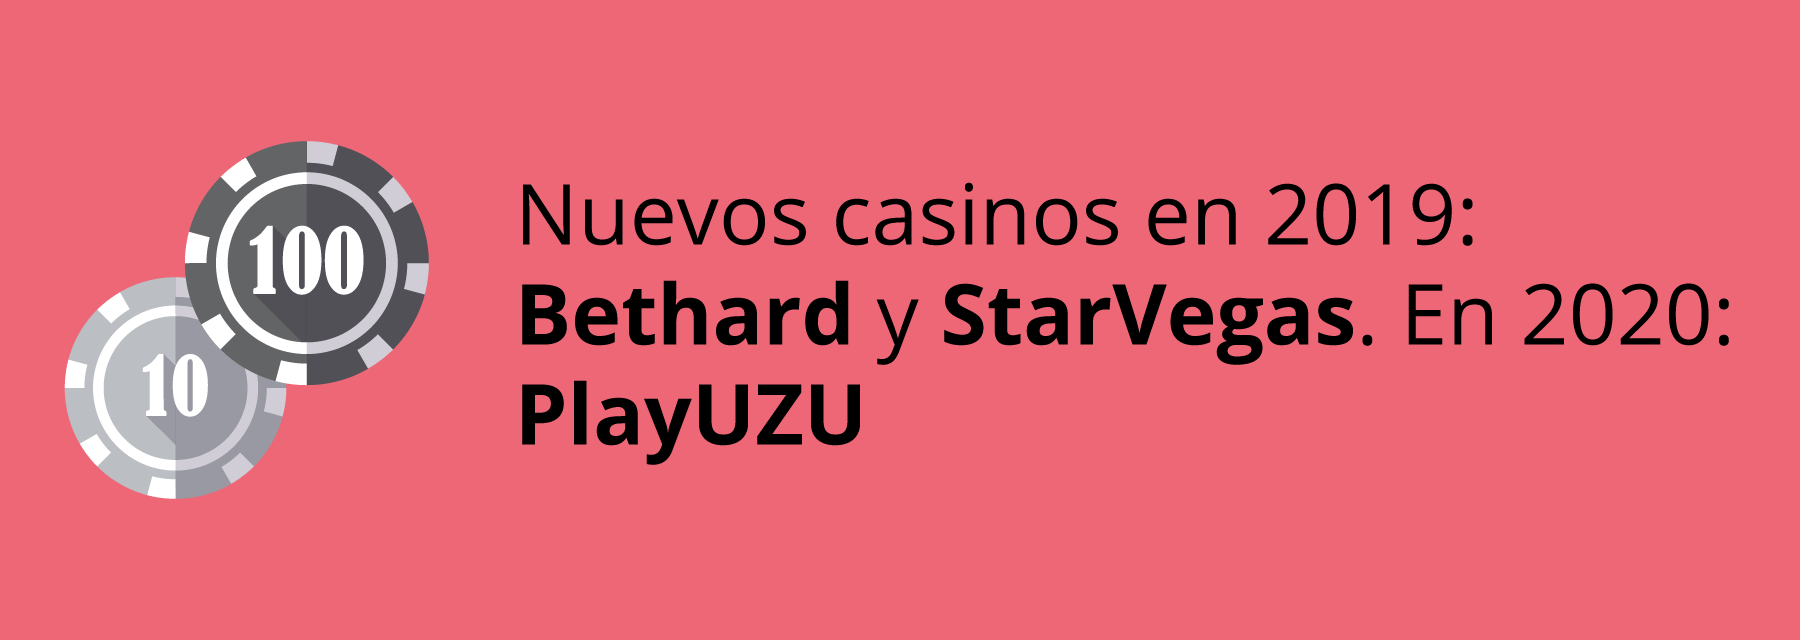 Nuevos casinos vs Casinos Esteblecidos